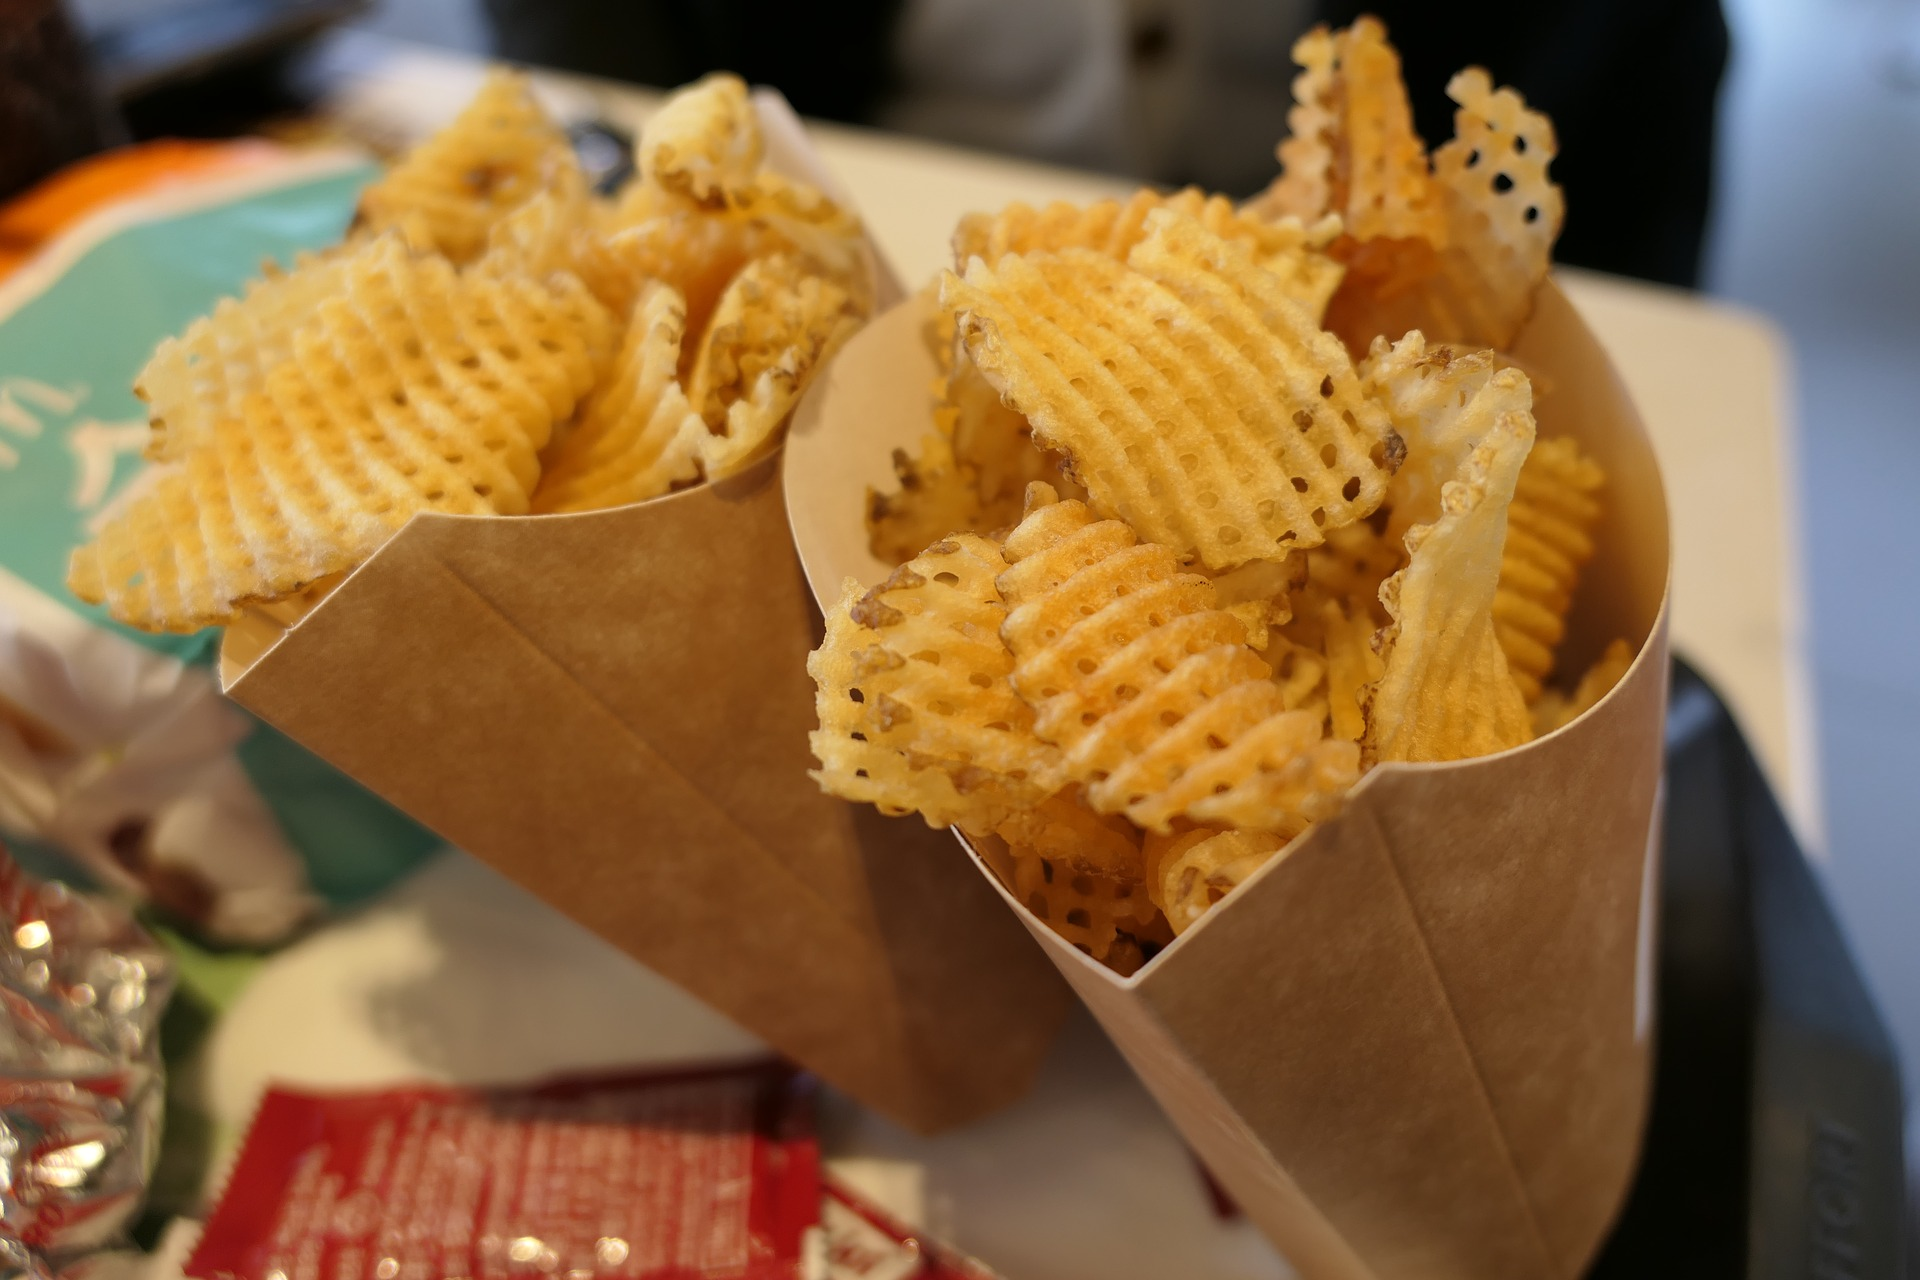 Alimentos procesados, patatas fritas